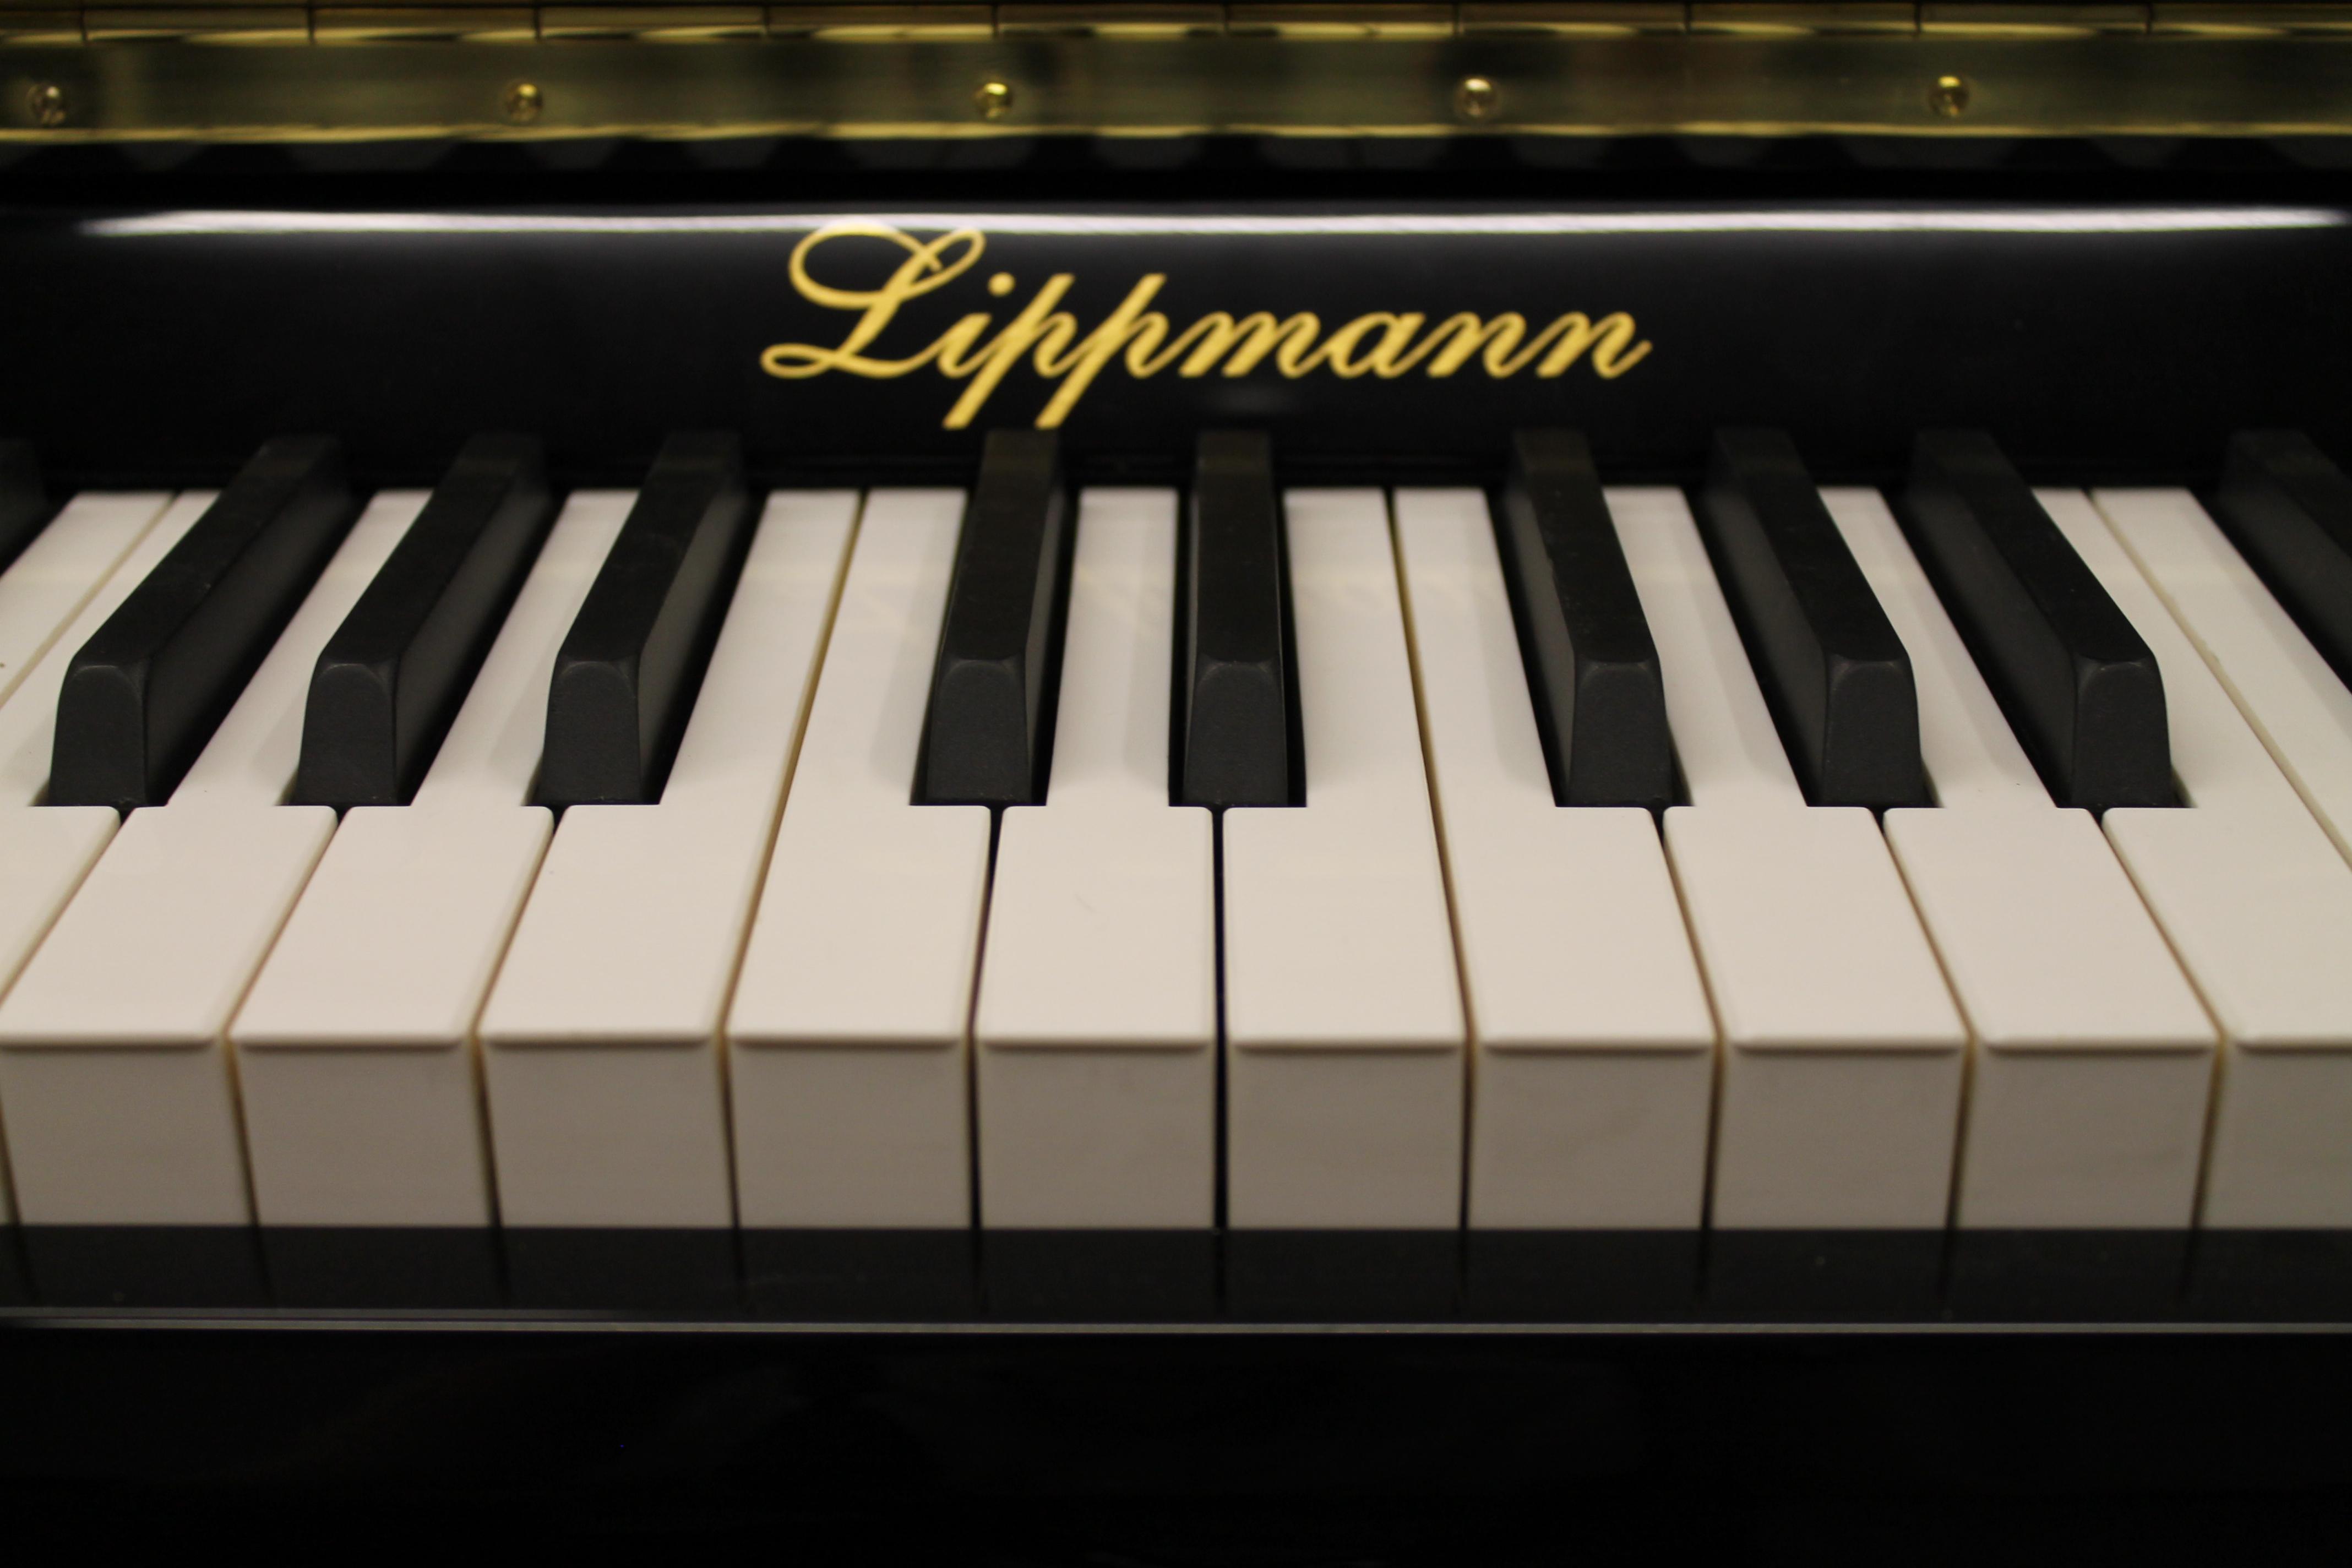 Lippmann Name Plate